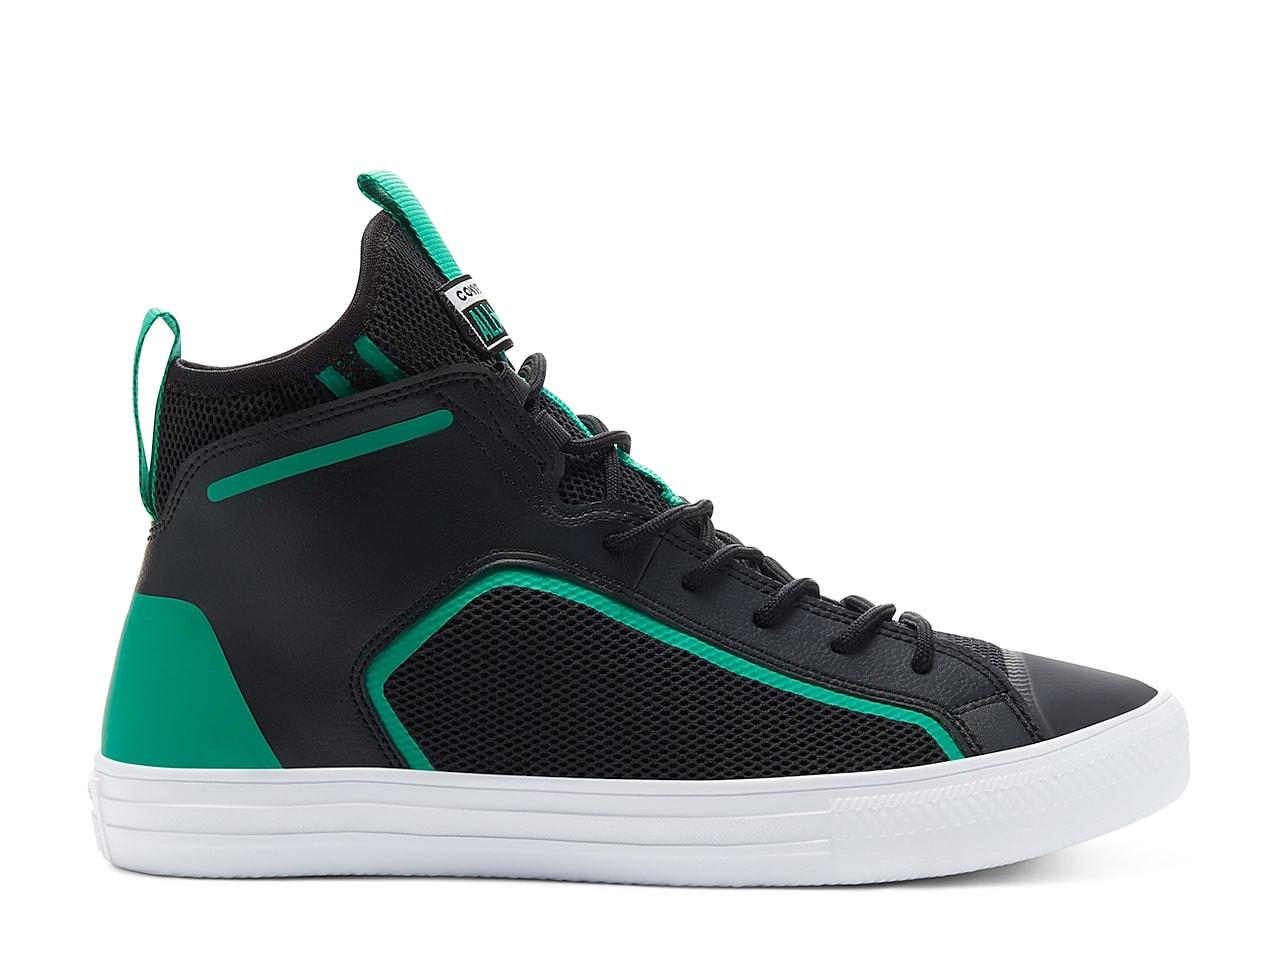 Converse Chuck Taylor All Star Ultra Sneaker - Men's